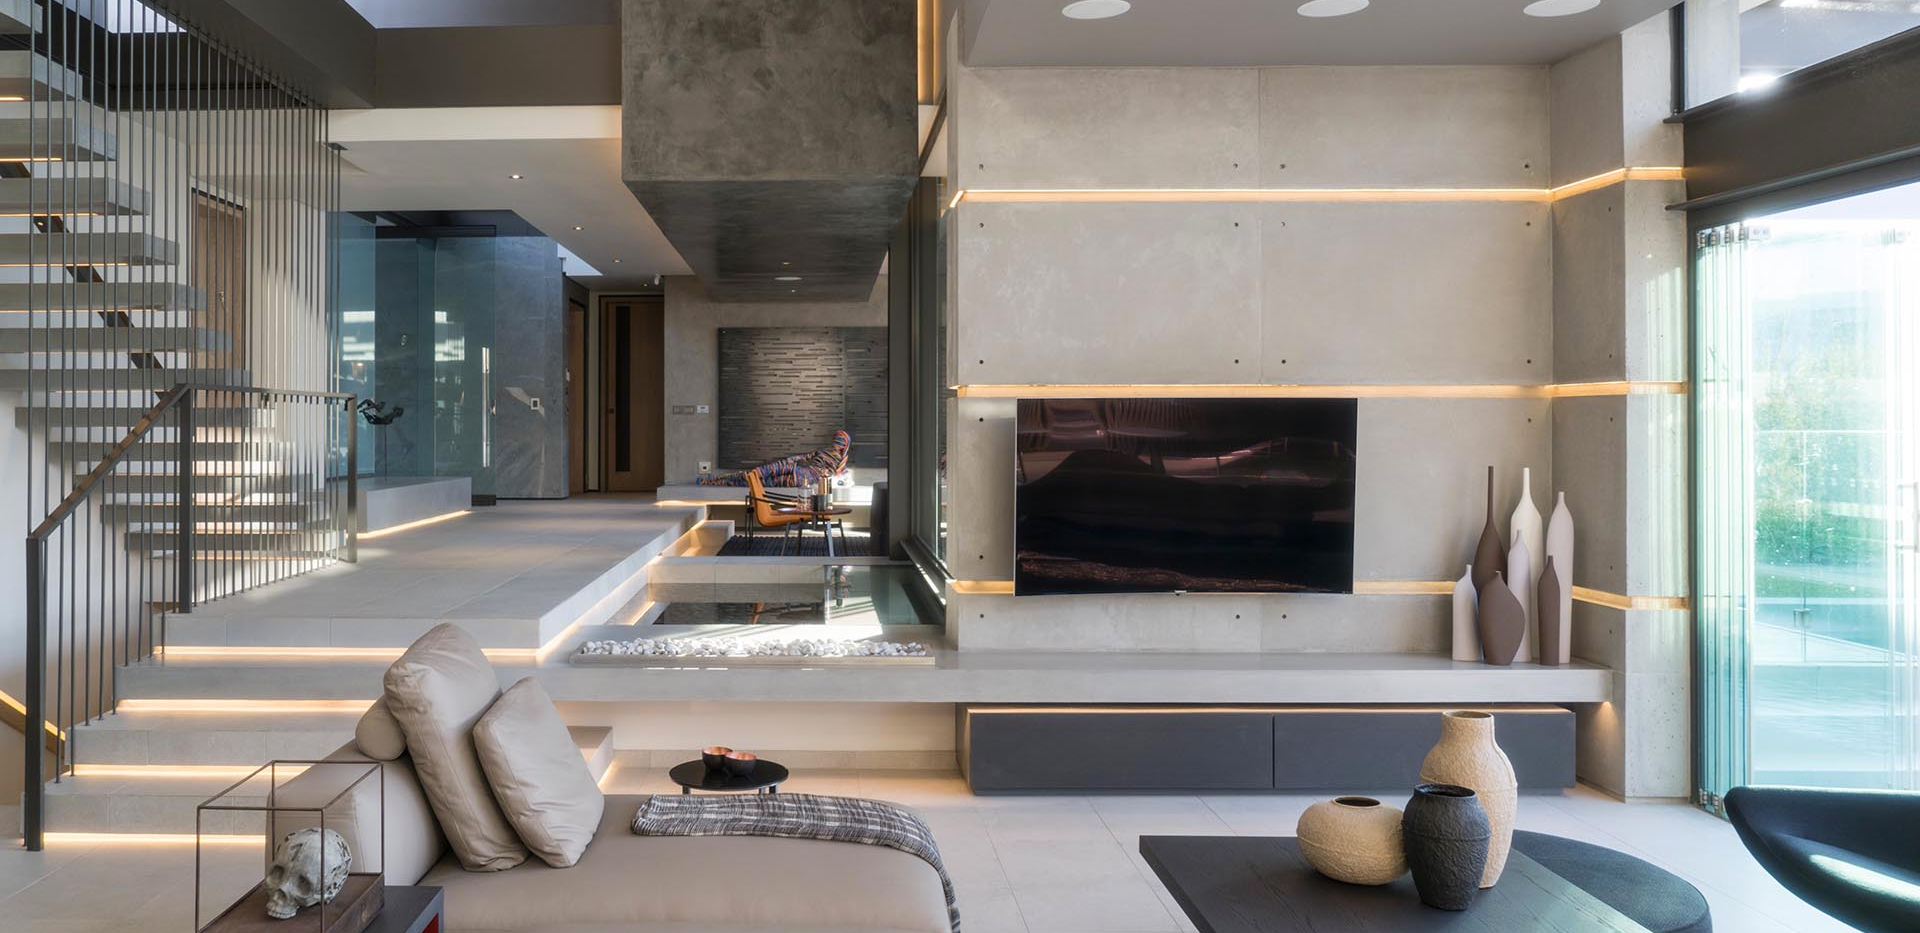 Faim interior decor